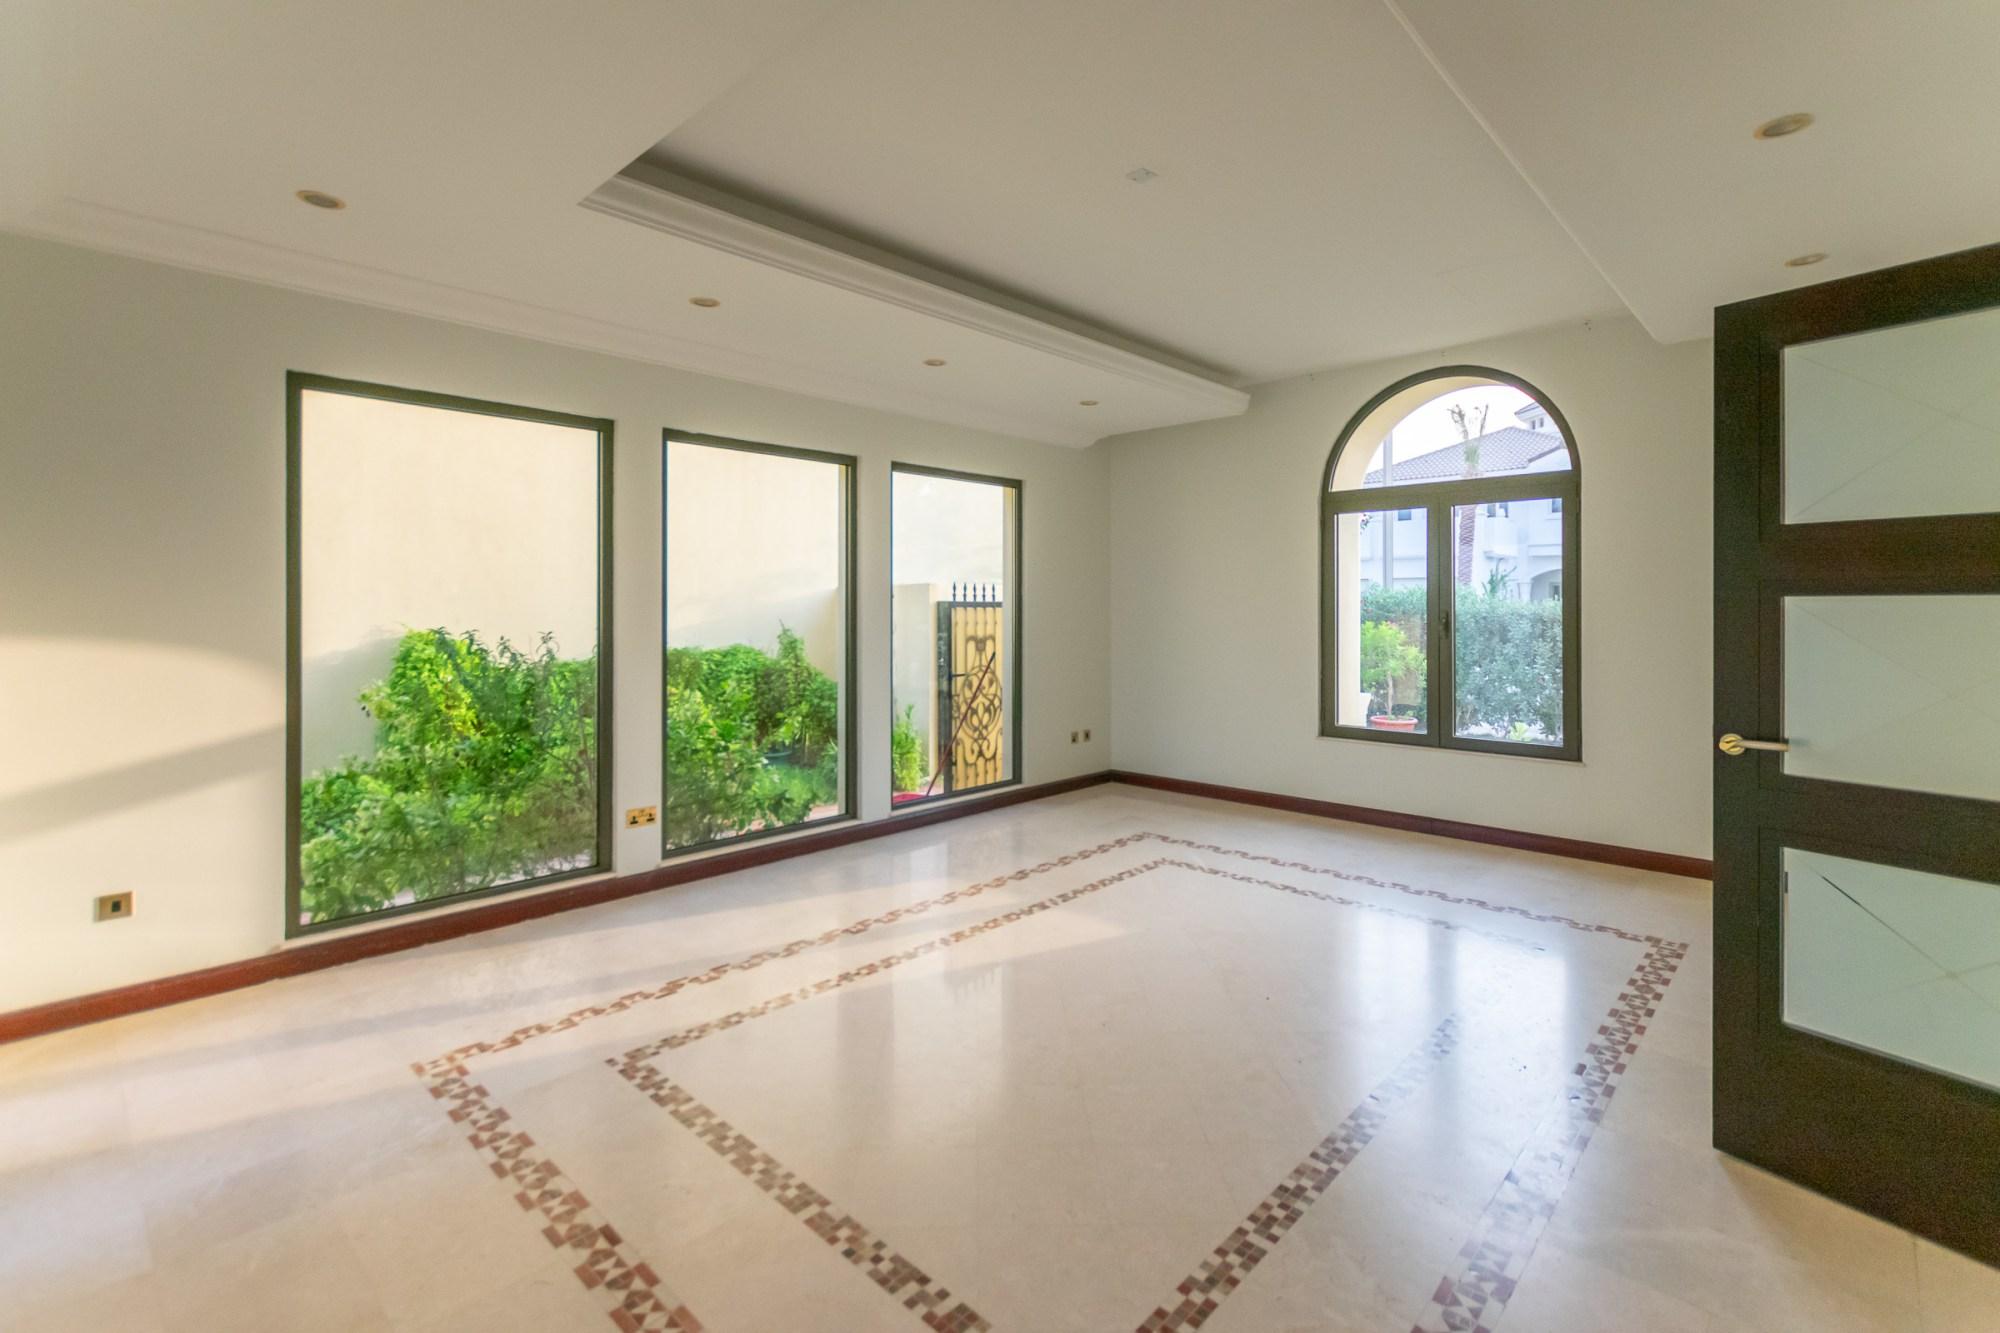 Atrium Entry | 4 Bed Villa | Marina View